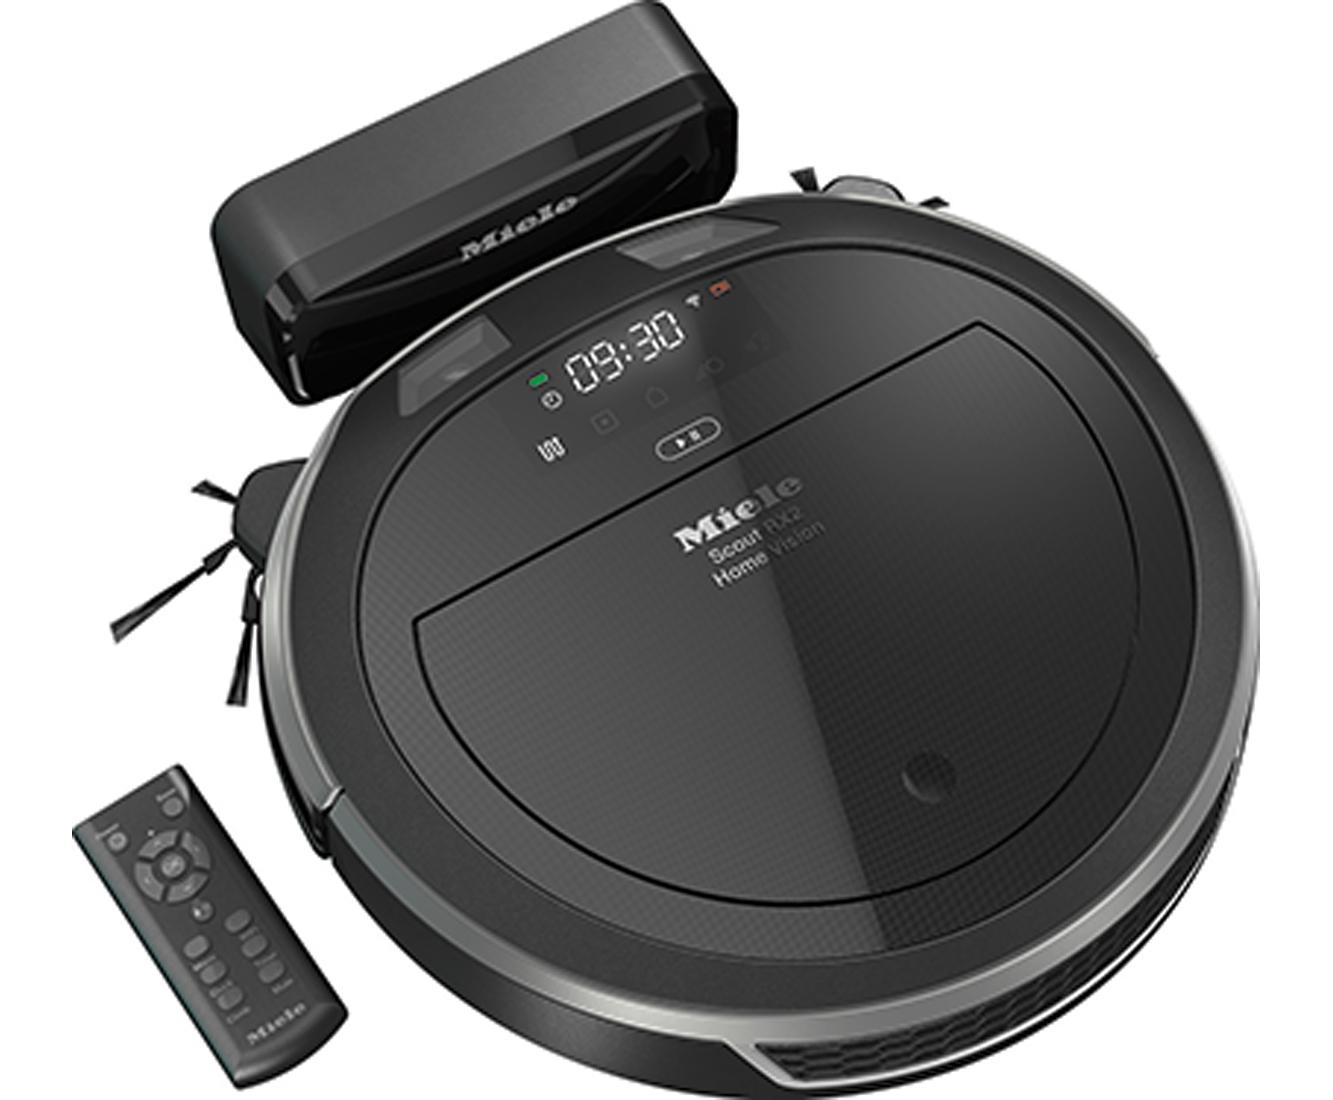 Miele Scout RX2 Home Vision Staubsauger - Schwarz / Grau | Flur & Diele > Haushaltsgeräte | Schwarz - Grau | Miele